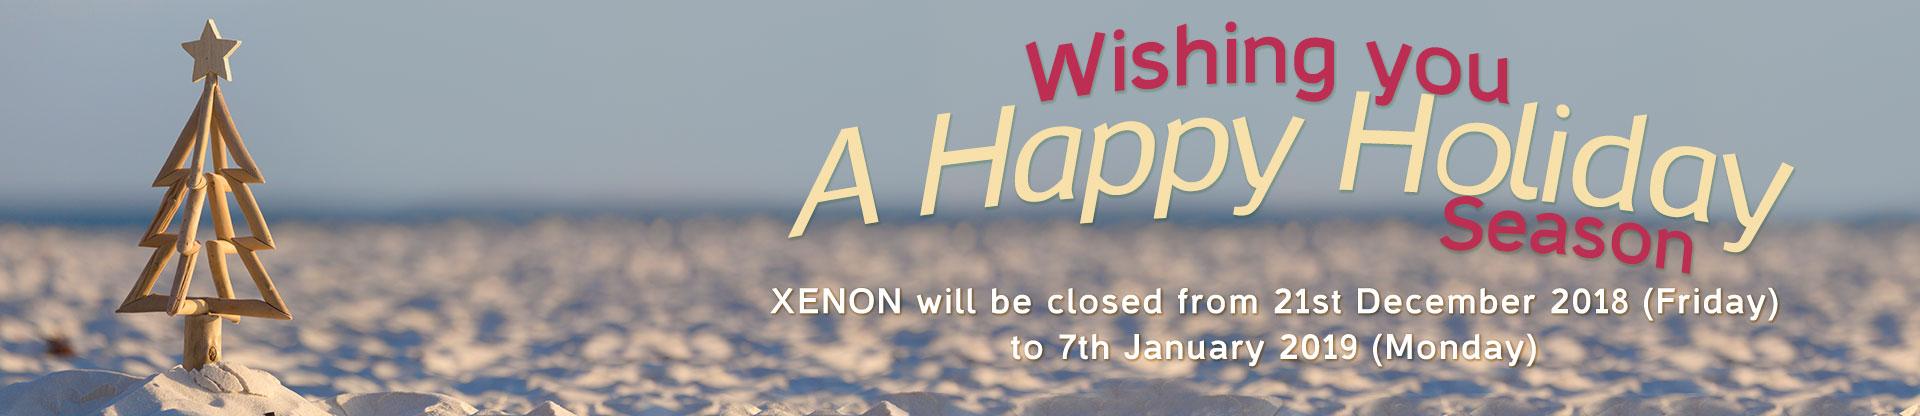 XENON XMAS Holiday Break Banner